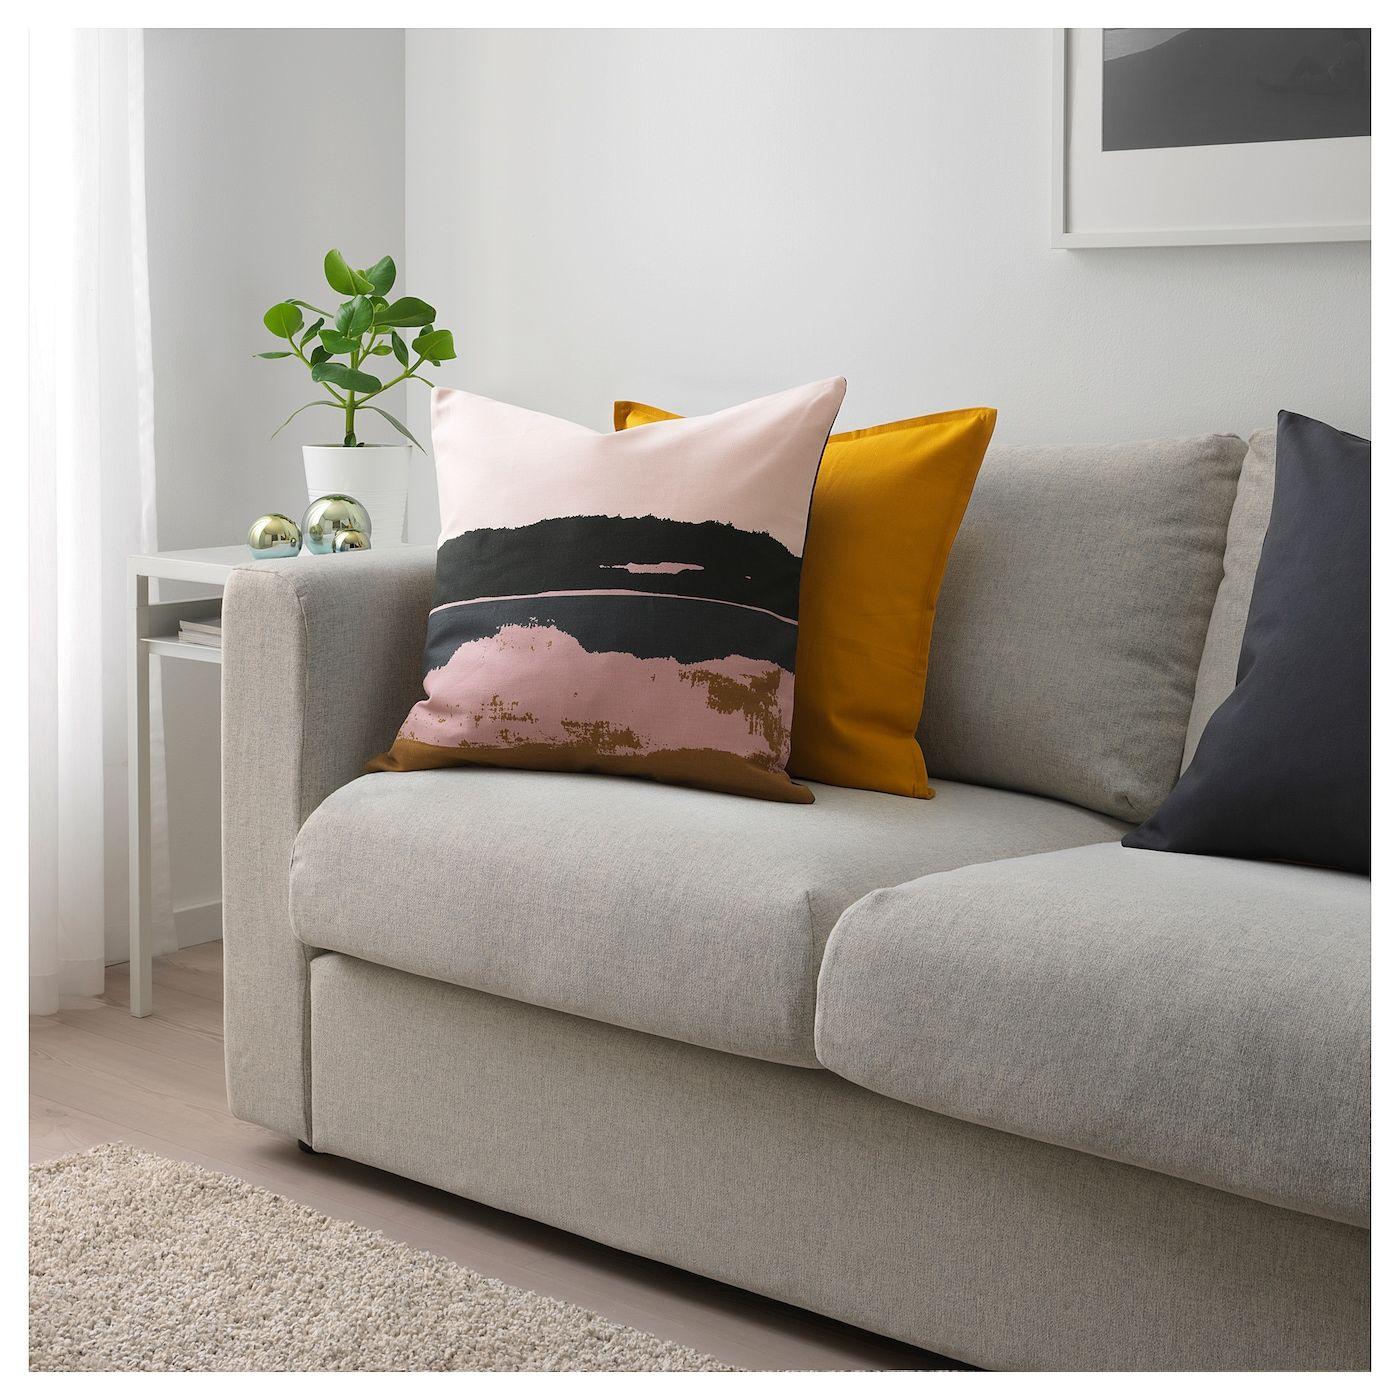 IKEA ELDTÖREL Cushion cover pink, multicolor Ikea